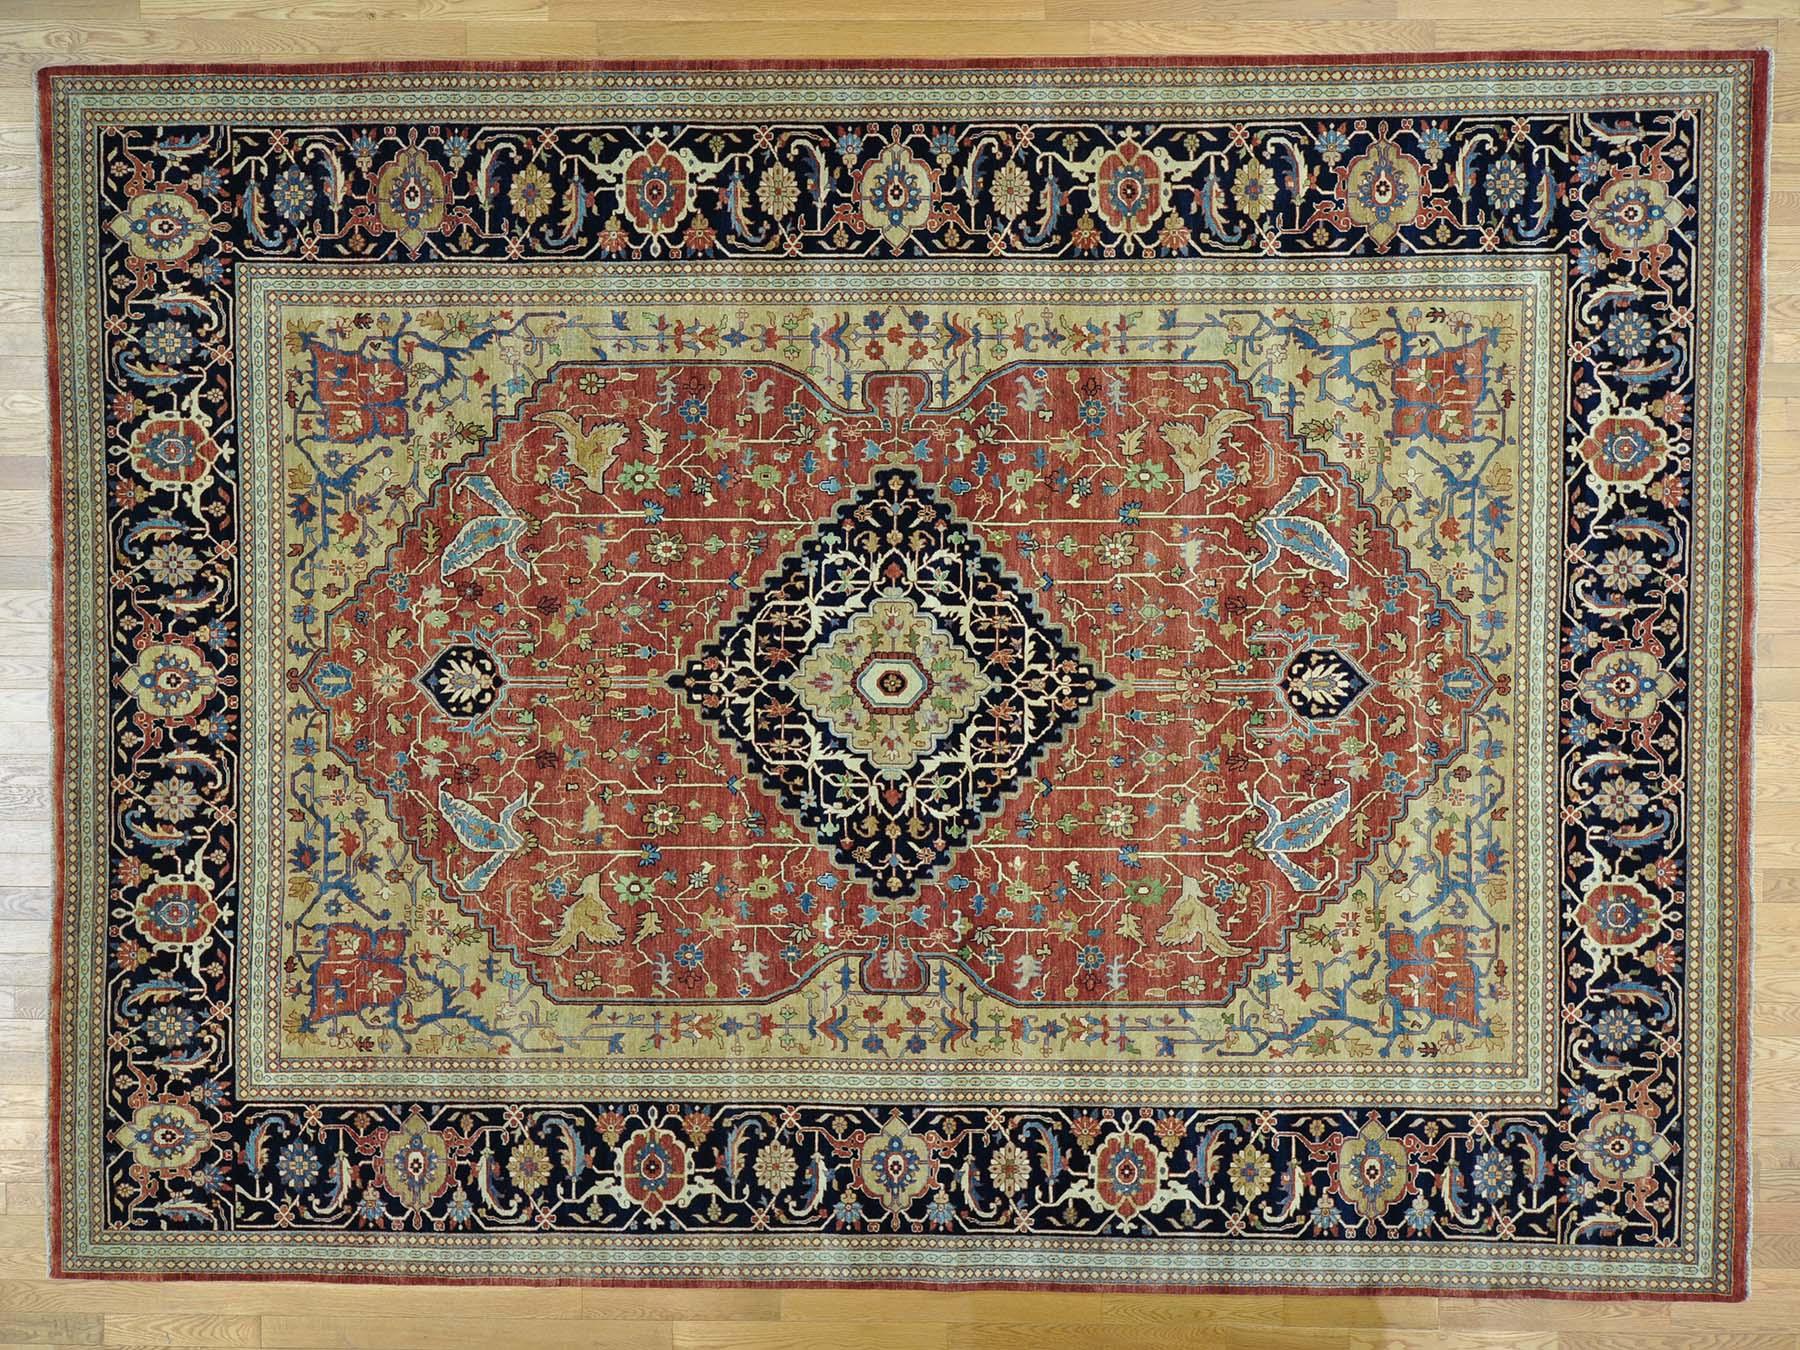 10 1 X 13 Antique Reproduction Sarouk Fine Wool Handmade Oriental Rug